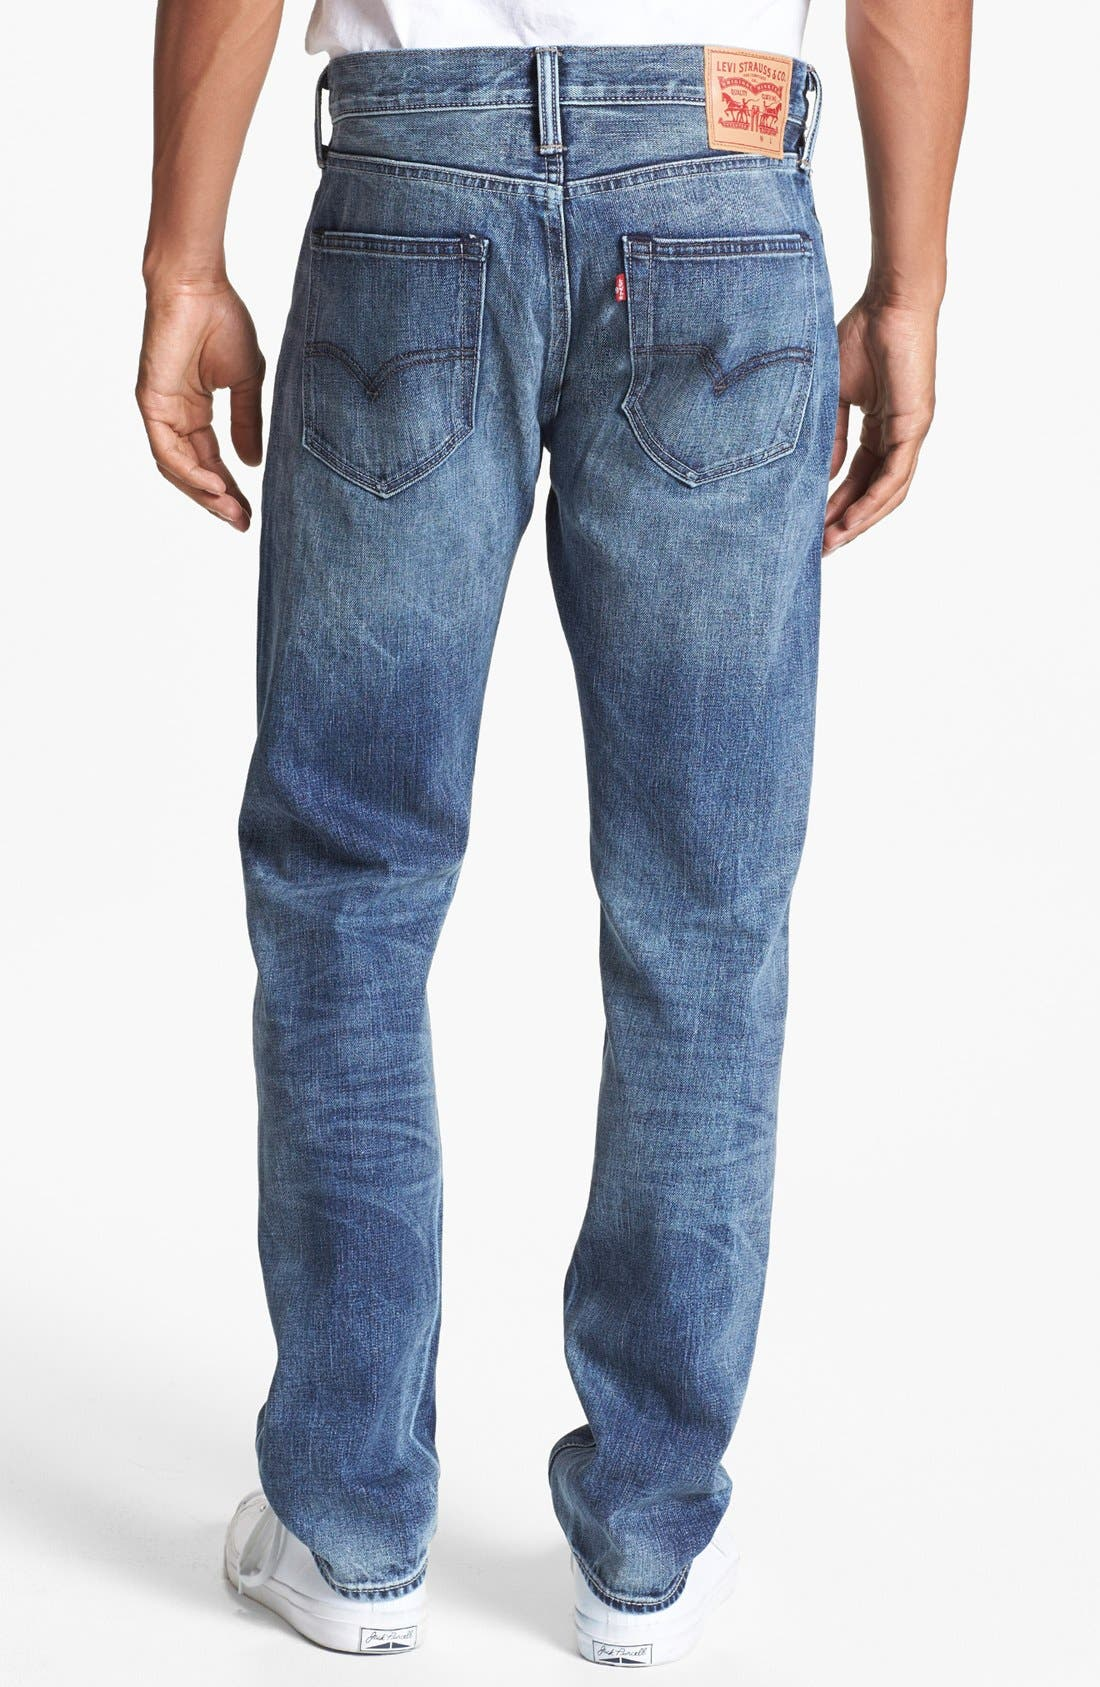 Alternate Image 1 Selected - Levi's® '508™' Skinny Fit Jeans (Splattered)